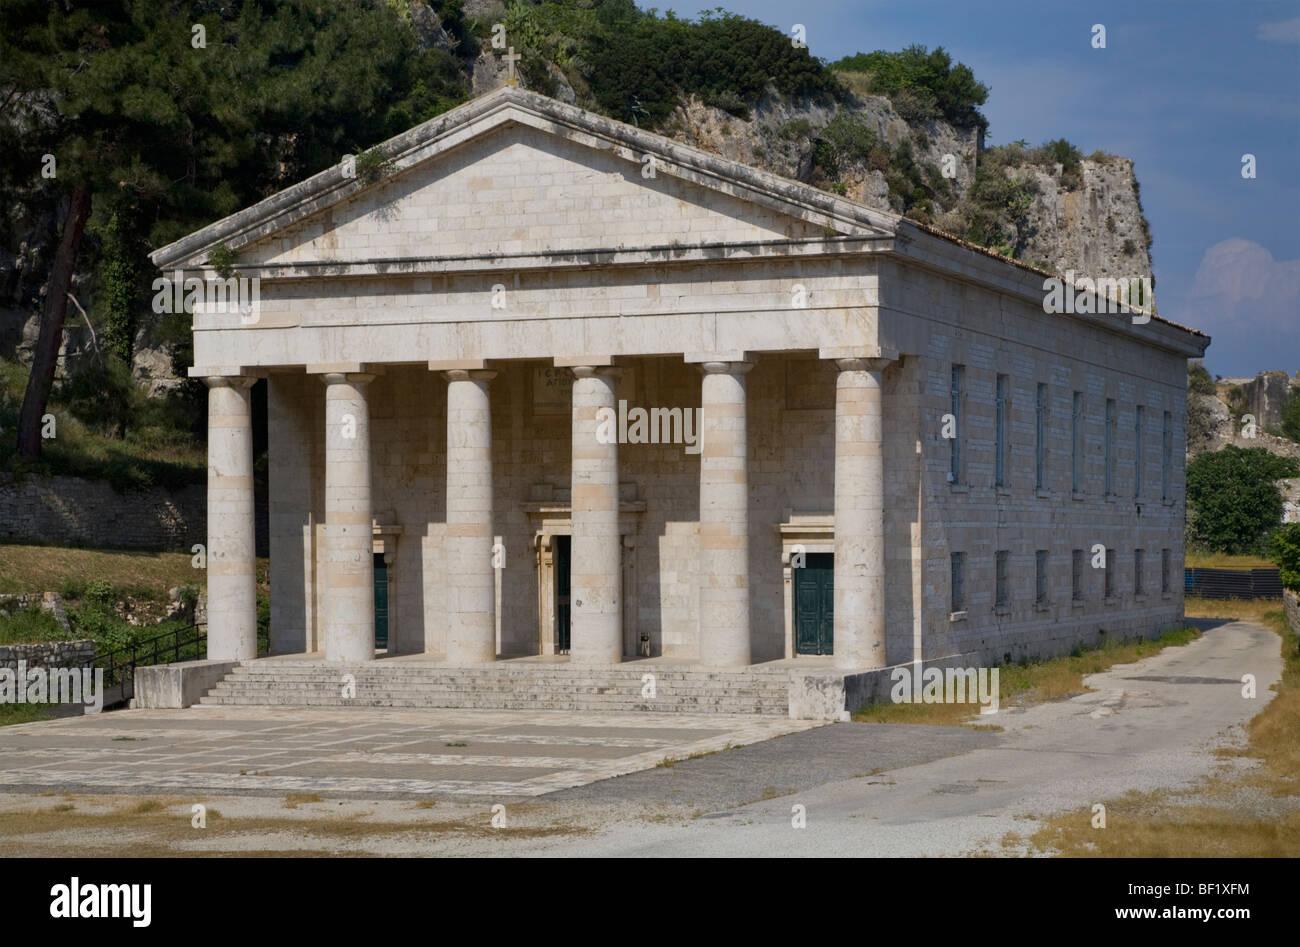 St. George's church in the old fortress, Kerkyra (Corfu), Greece - Stock Image